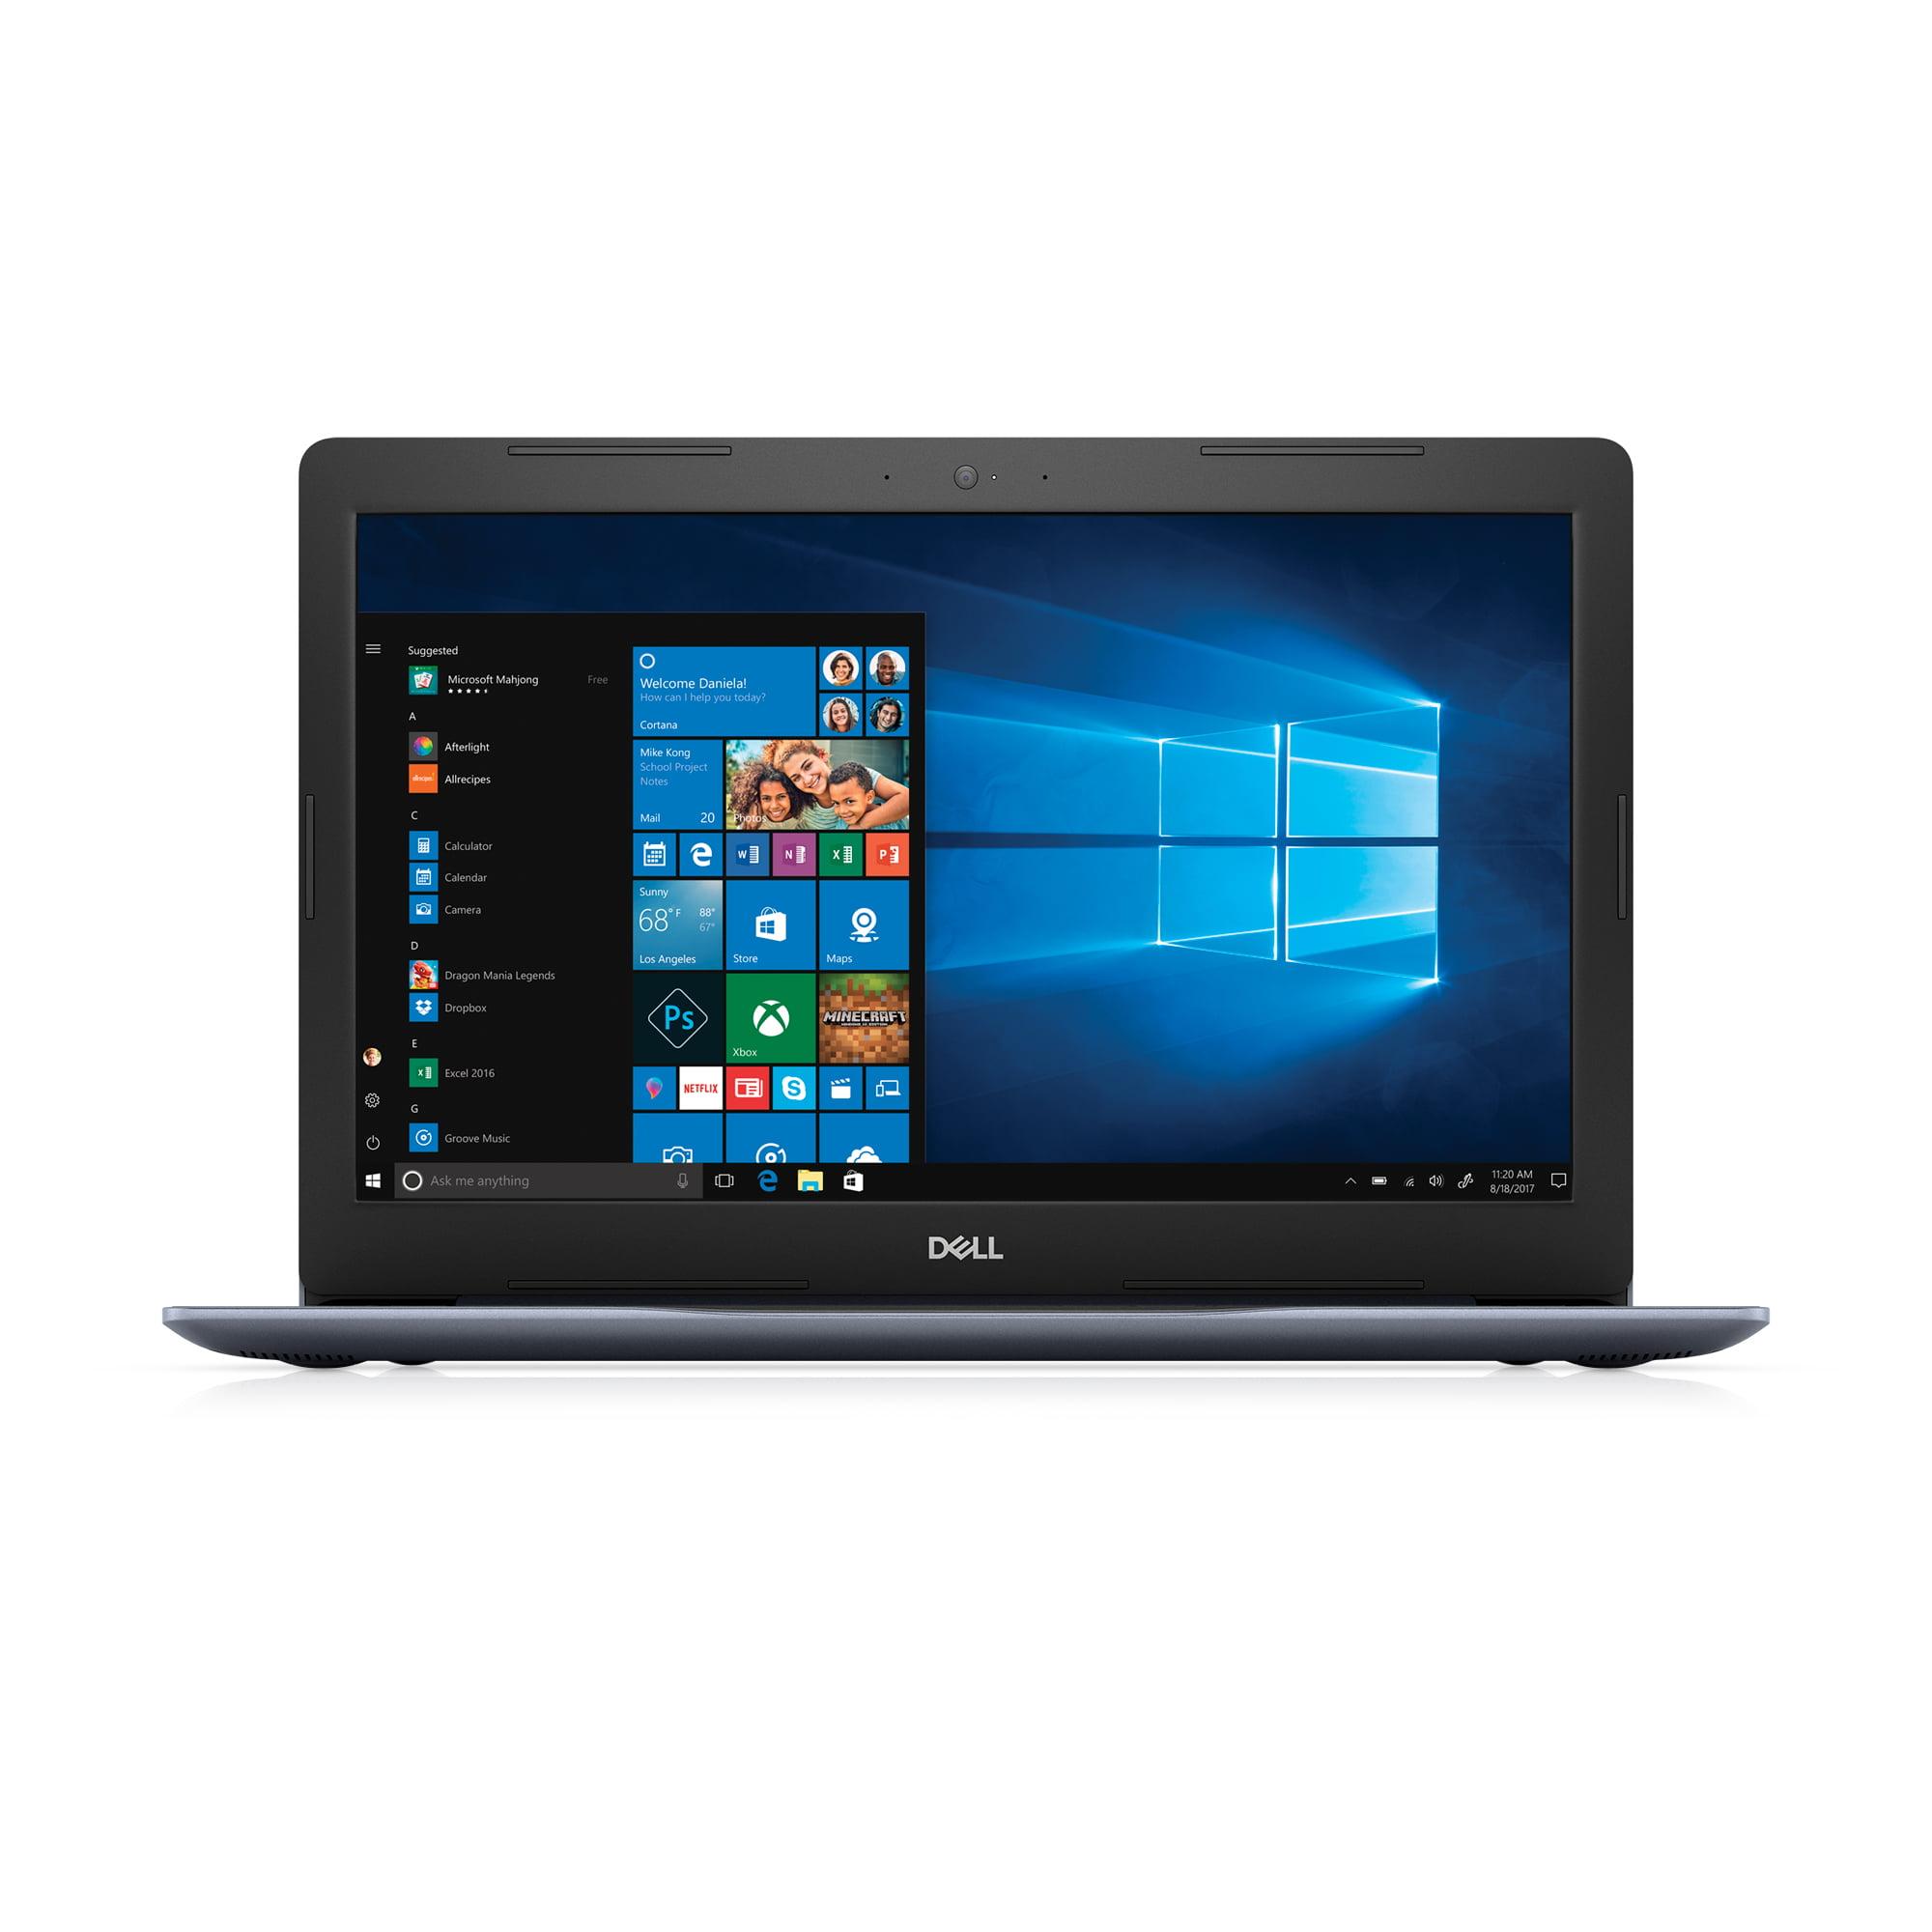 "Dell Inspiron 15 5000 (5575) Laptop, 15.6"", AMD Ryzen™ 3 2200U with Radeon Vega3 Graphics, Integrated Graphics with AMD APU, 1TB HDD, 8GB RAM, i5575-A765BLU-PUS"